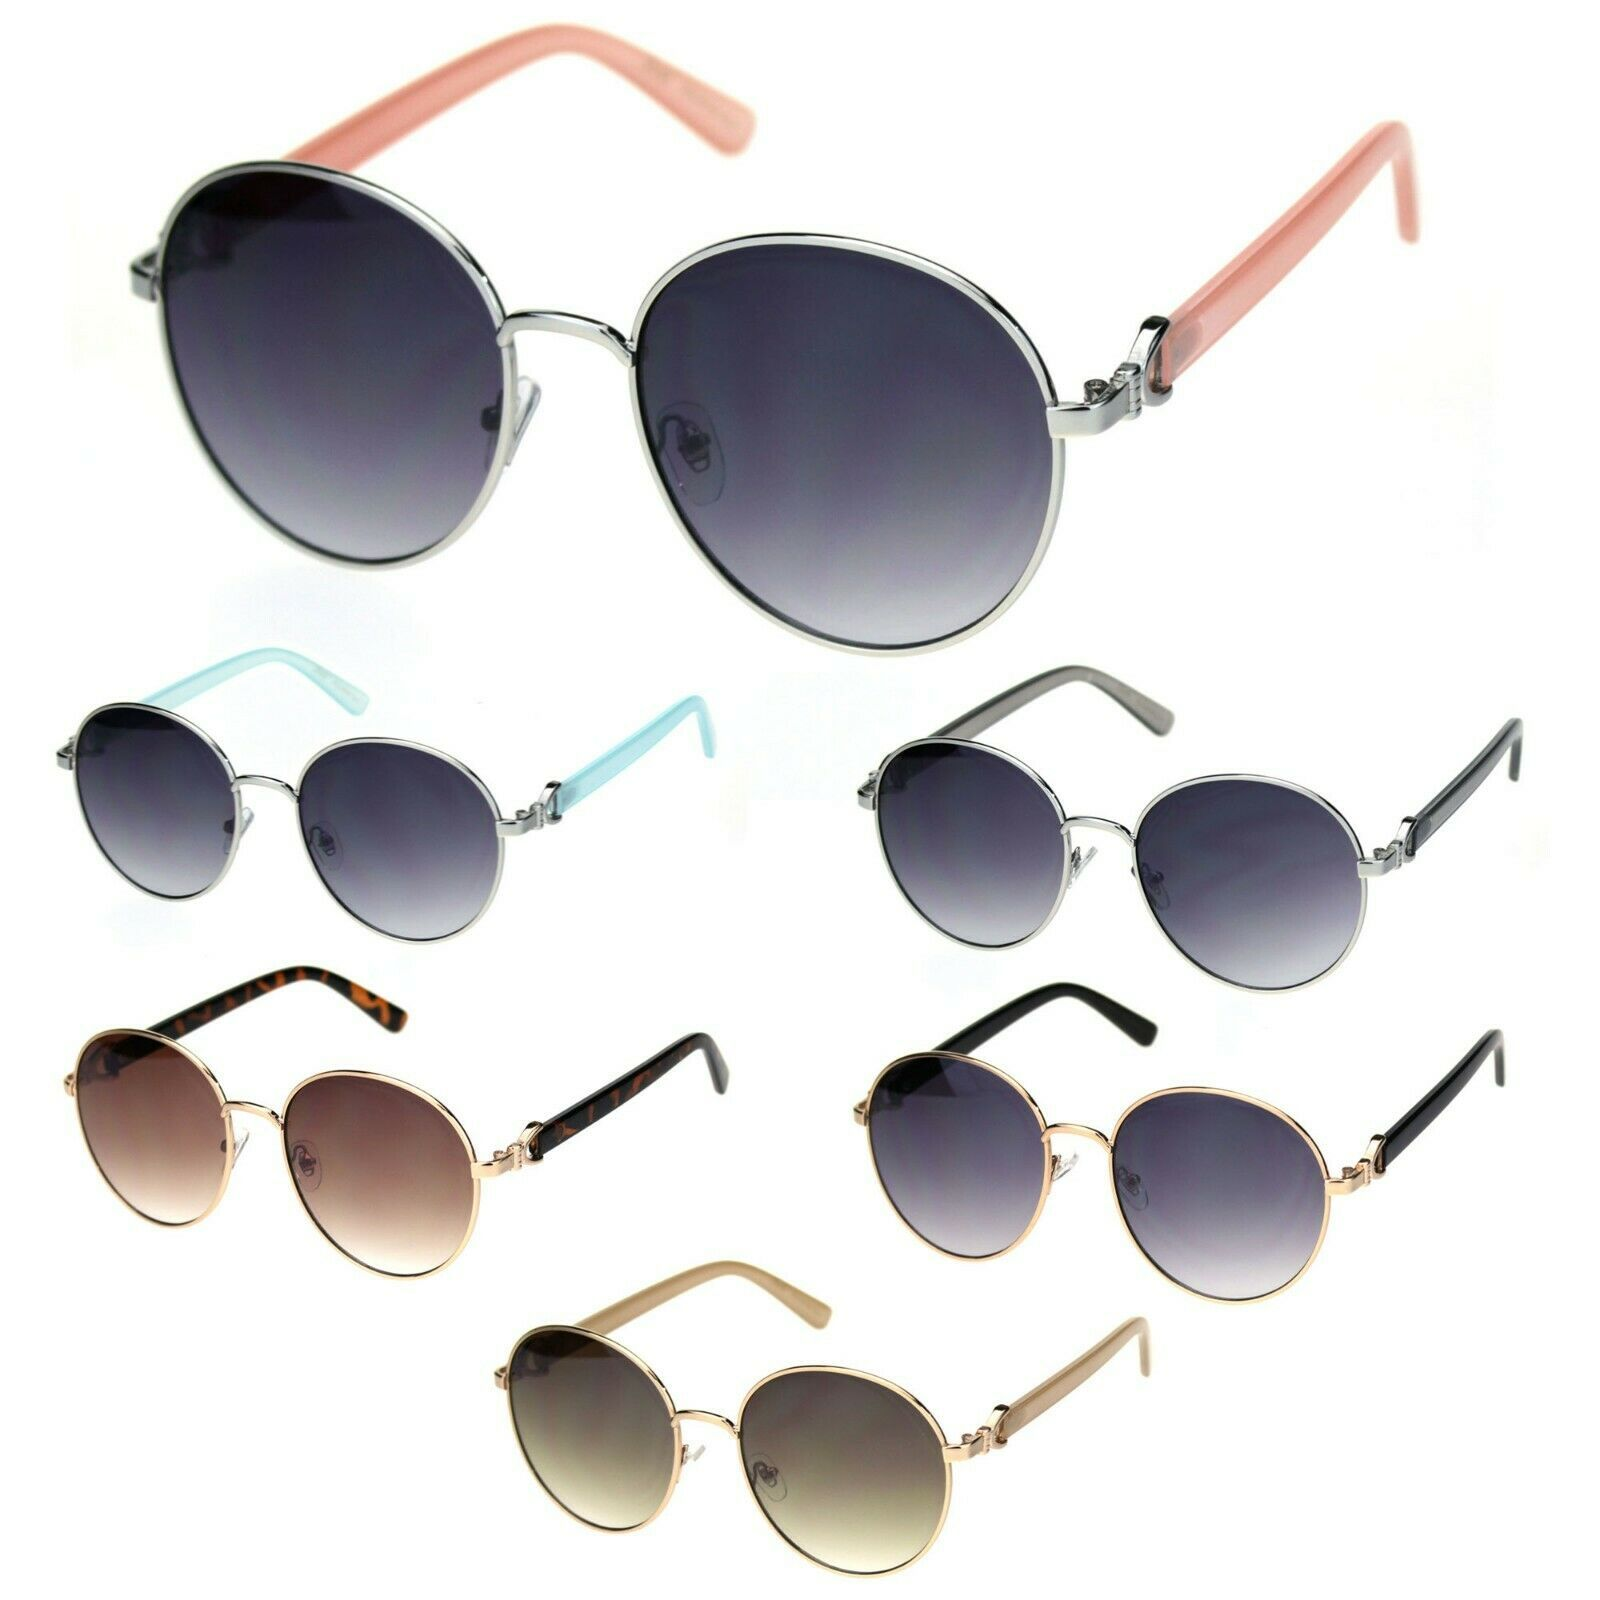 Giselle Womens Boyfriend Style Round Metal Rim Designer Sunglasses